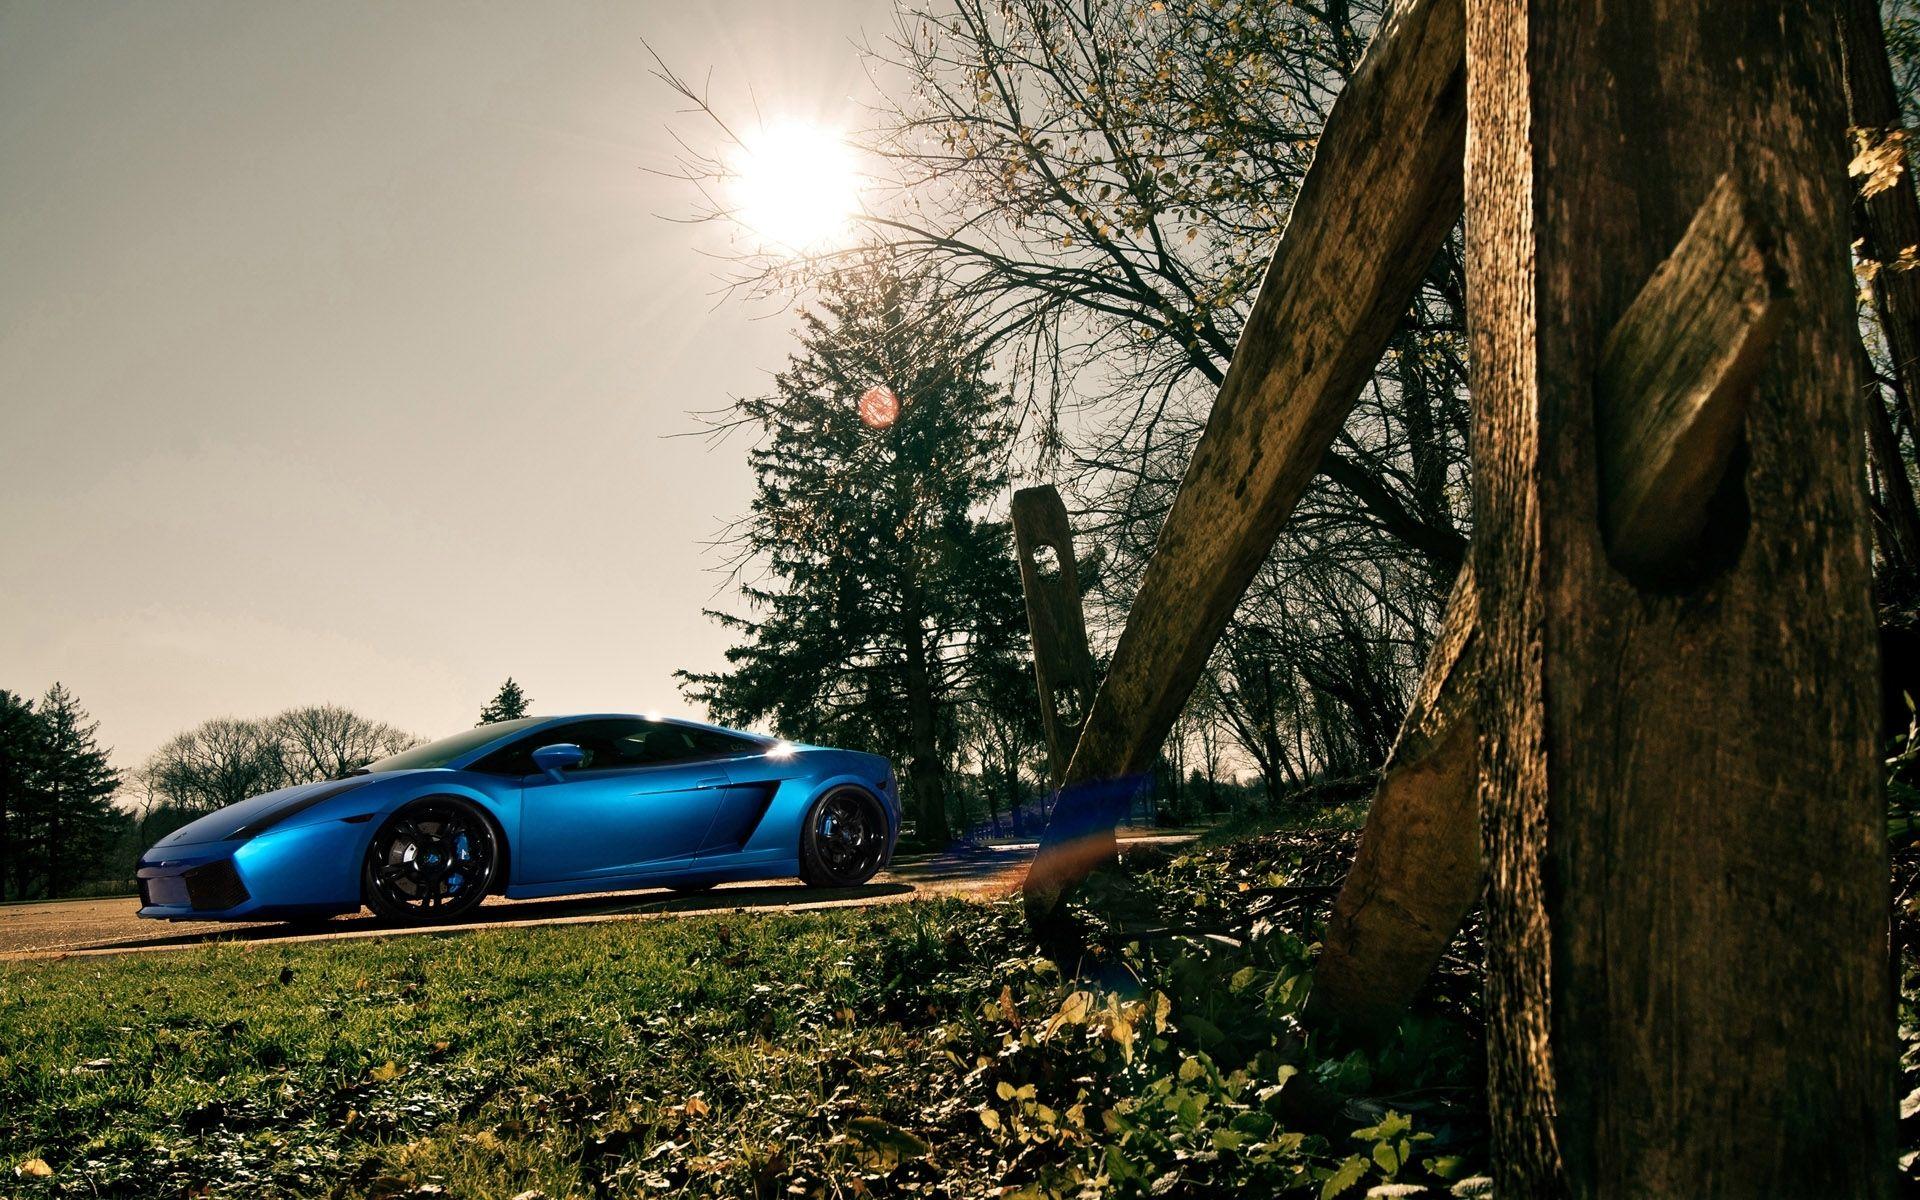 #auto, #cars, #Lamborghini, #supercar, #Tuning cars, #supercars, #Gallardo, #Lamborghini Gallardo, #cars walls